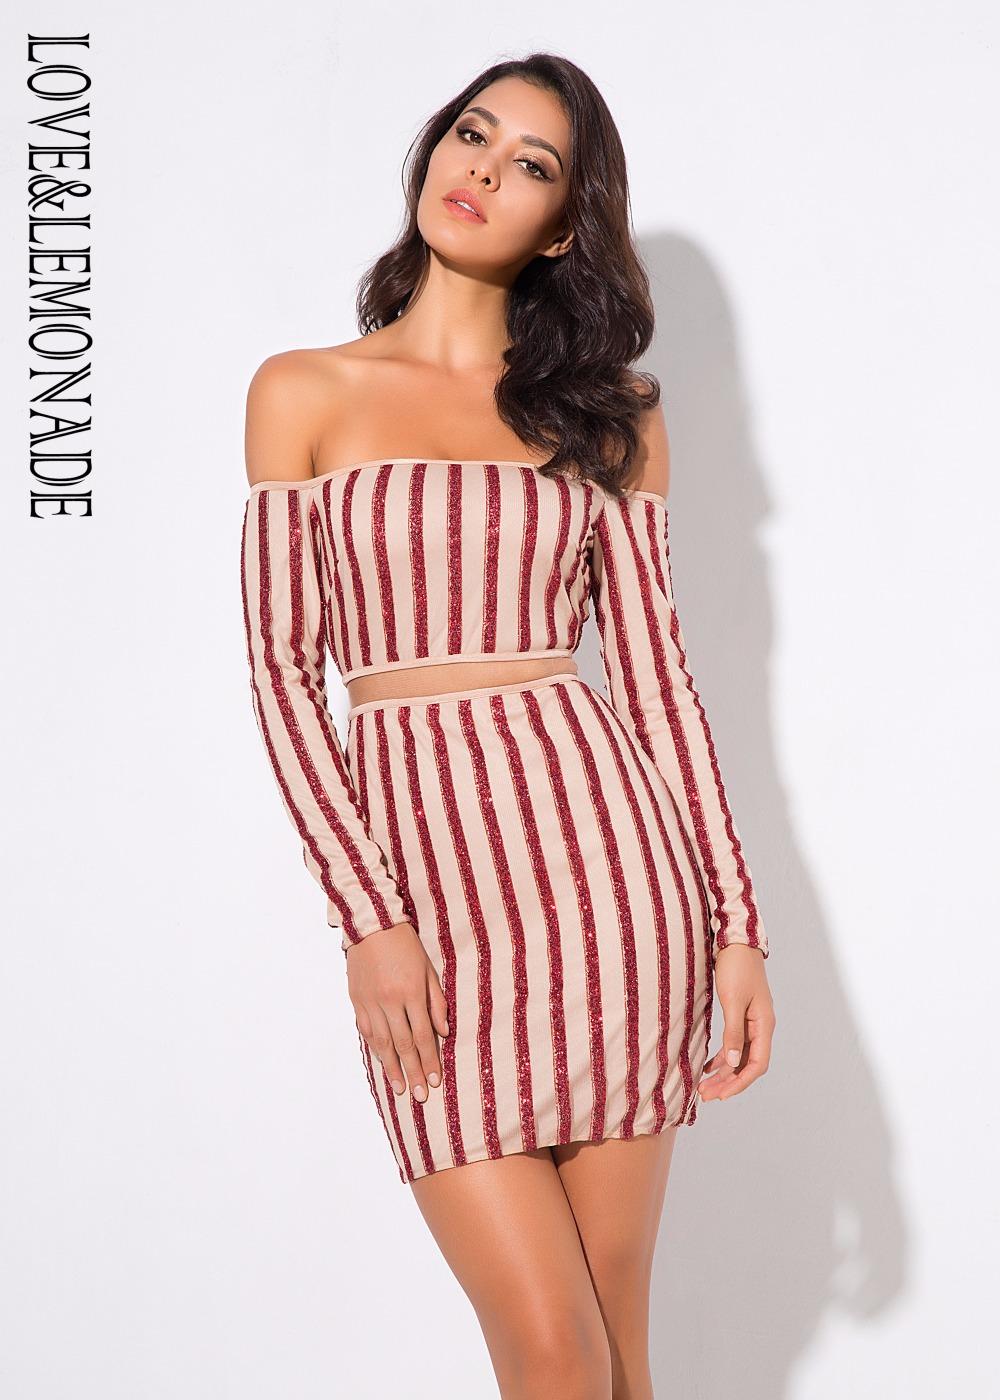 Love Lemonade . Red   Nude Color Neck Mesh Stripes Stitching Dress 3 COLORS  LM0691 2f3251d7ed2c